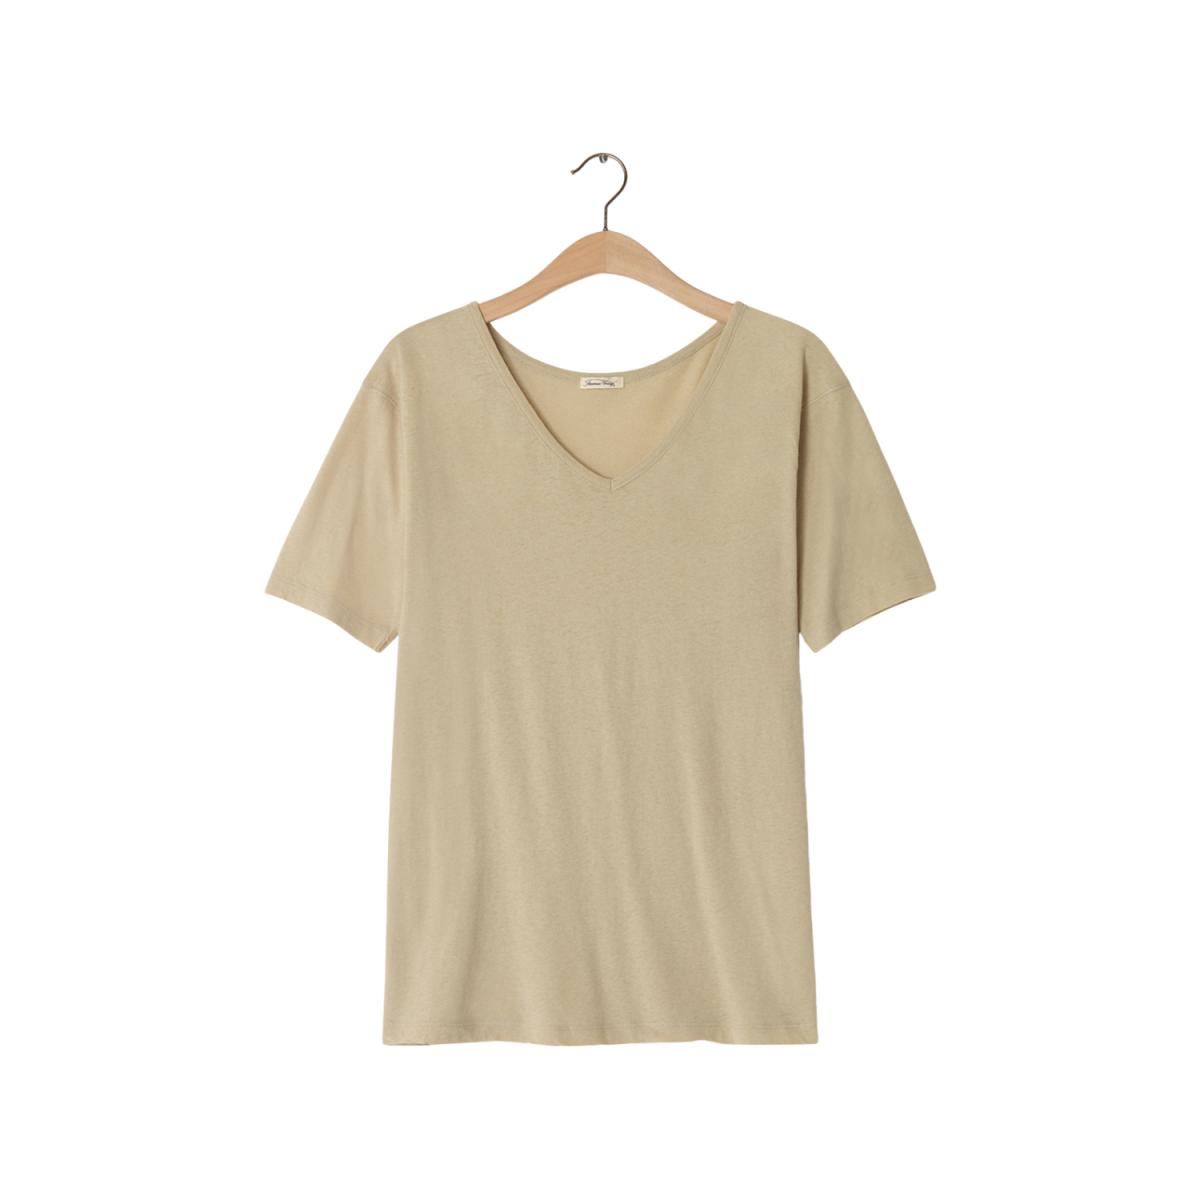 fakobay t-shirt mastic